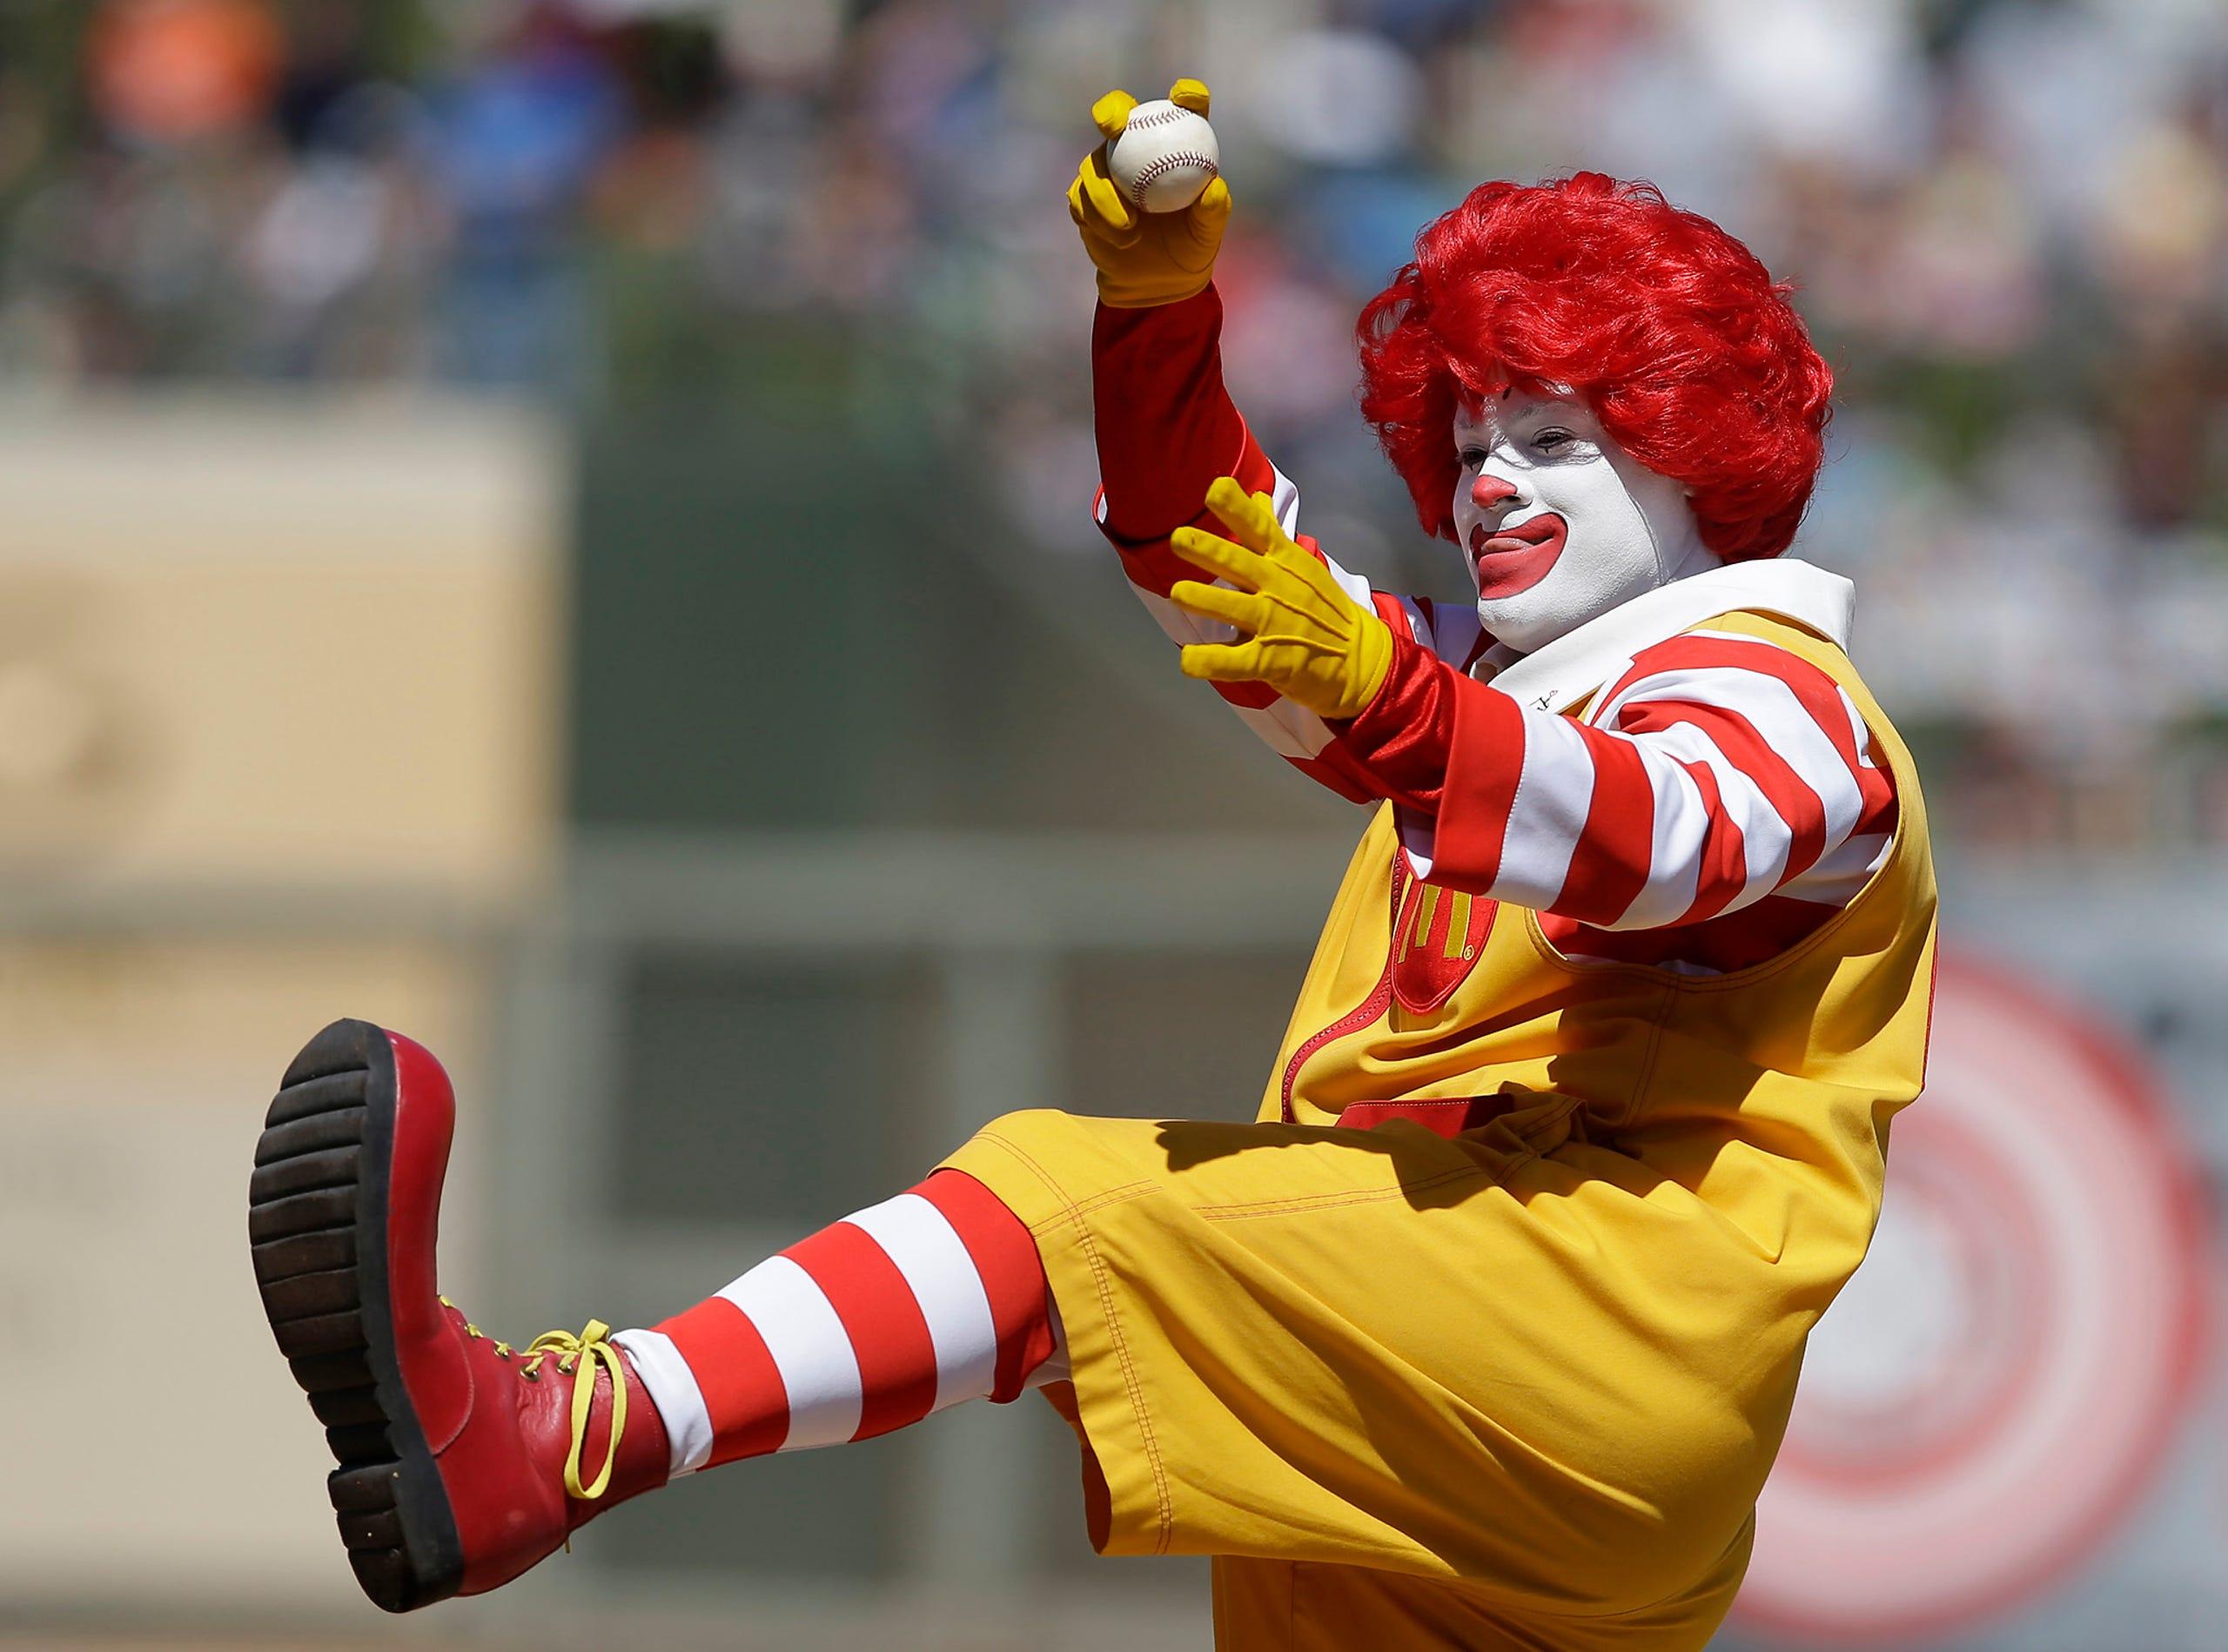 Ronald McDonald through the years